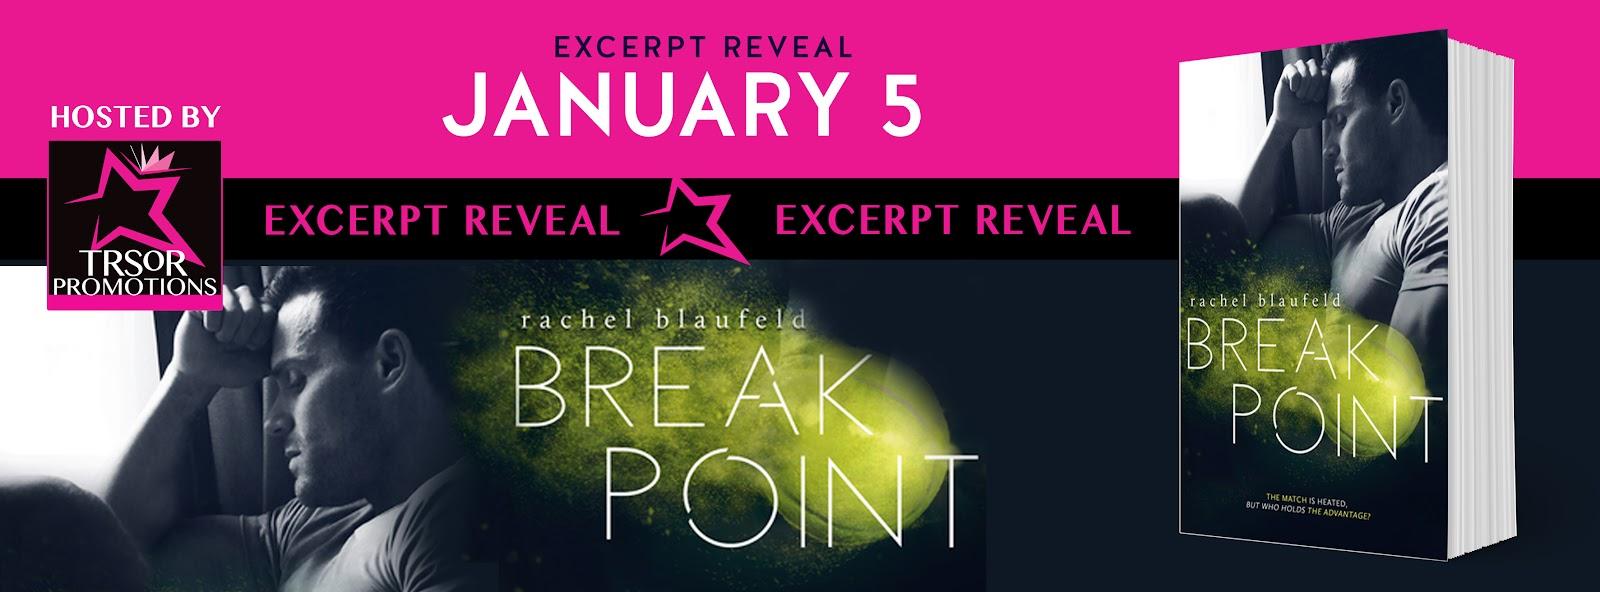 BREAK_POINT_EXCERPT.jpg